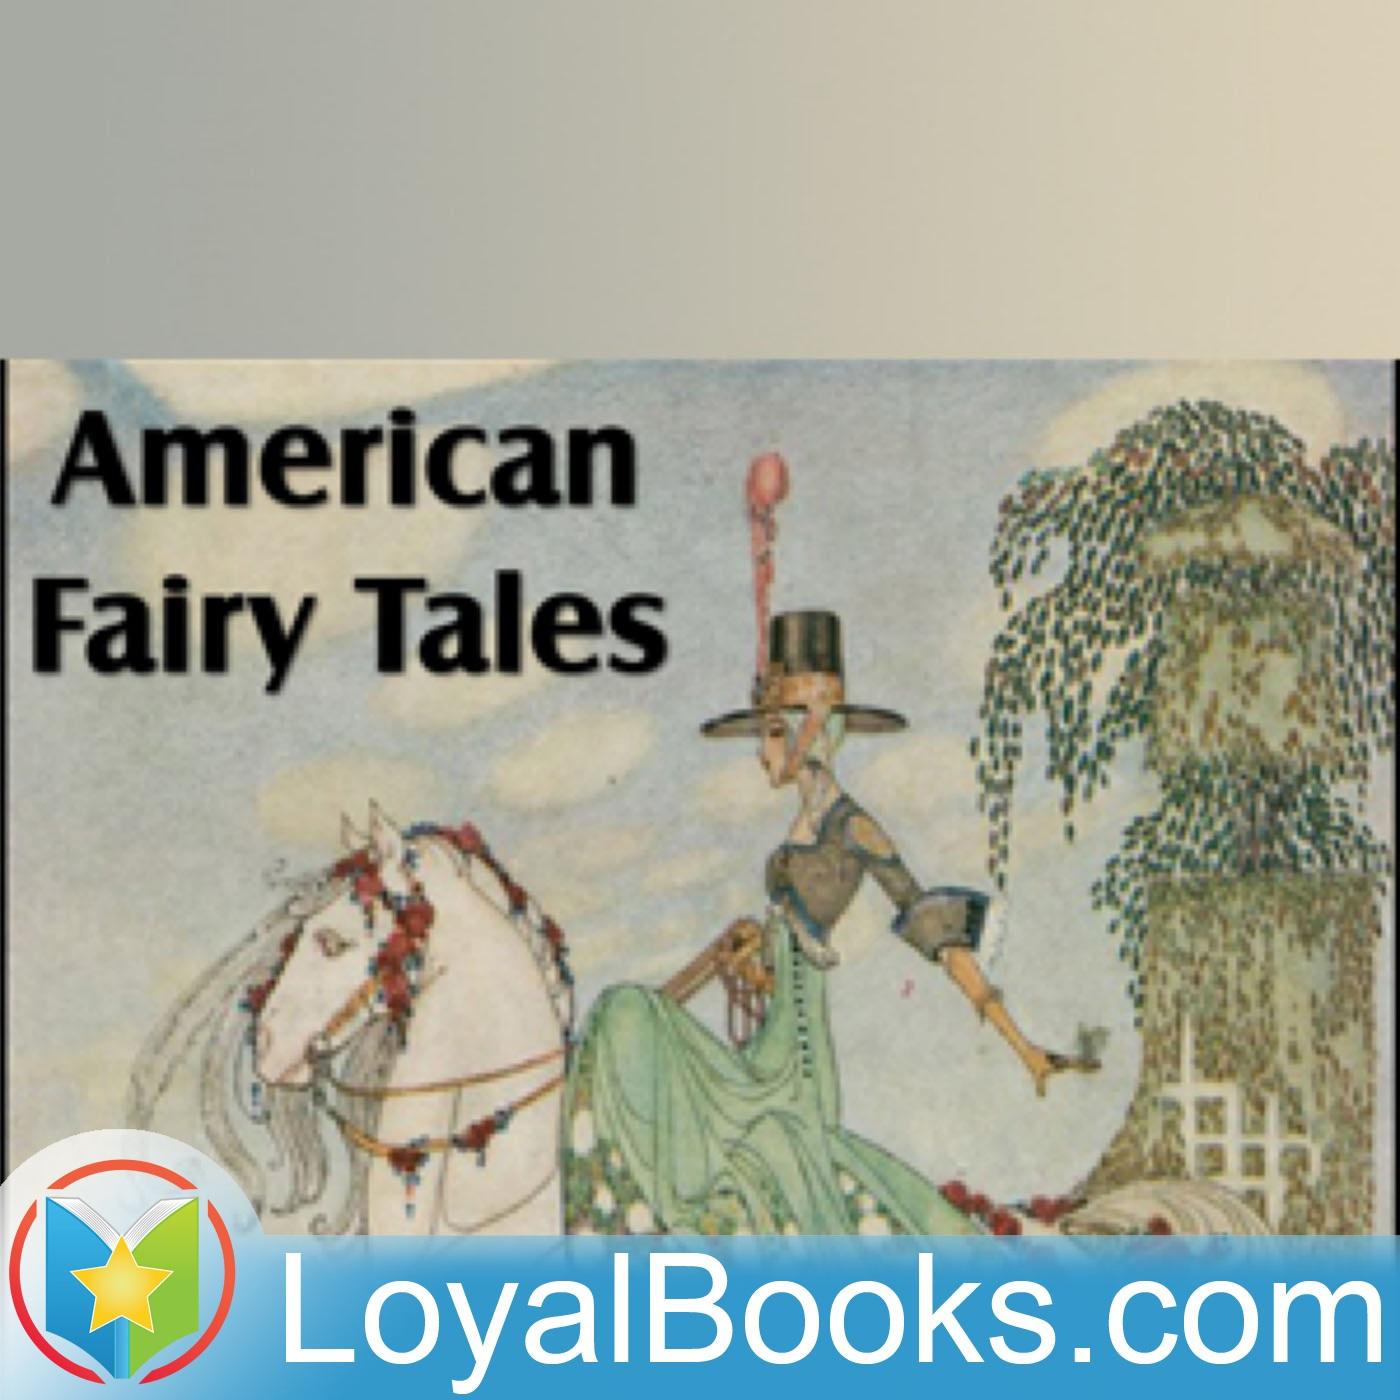 <![CDATA[American Fairy Tales by L. Frank Baum]]>